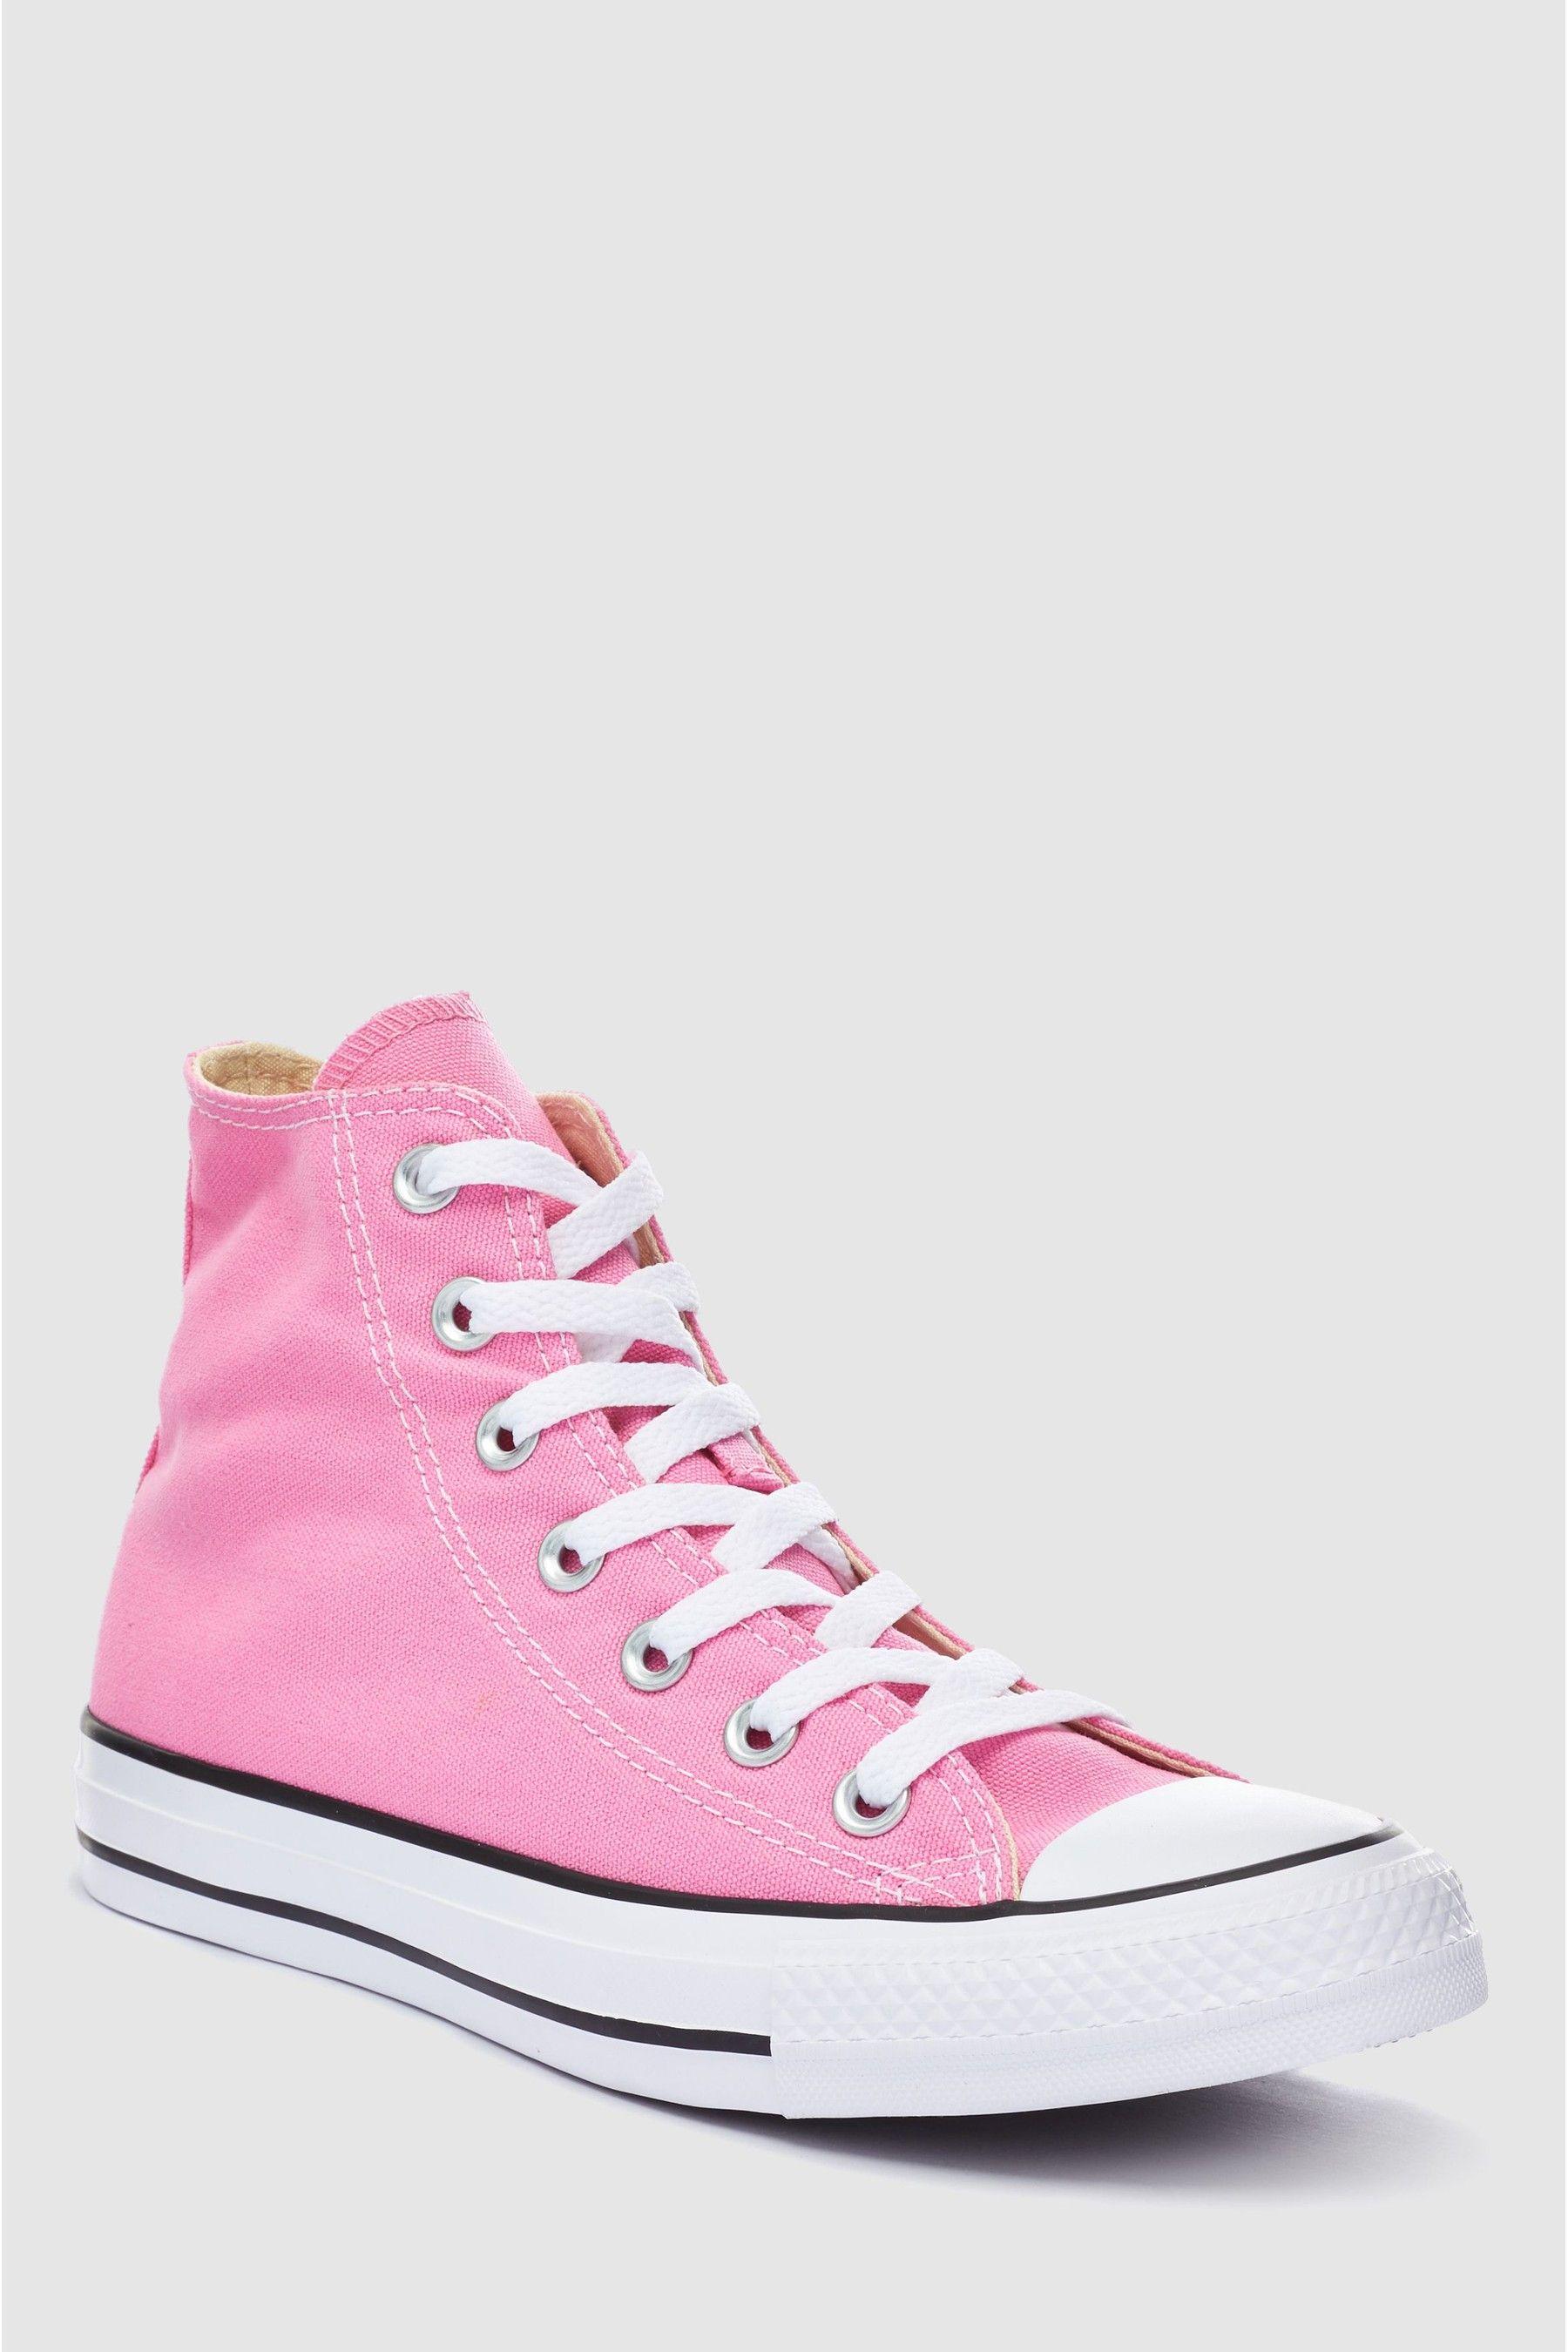 Girls Converse Youth Pink Chuck Hi